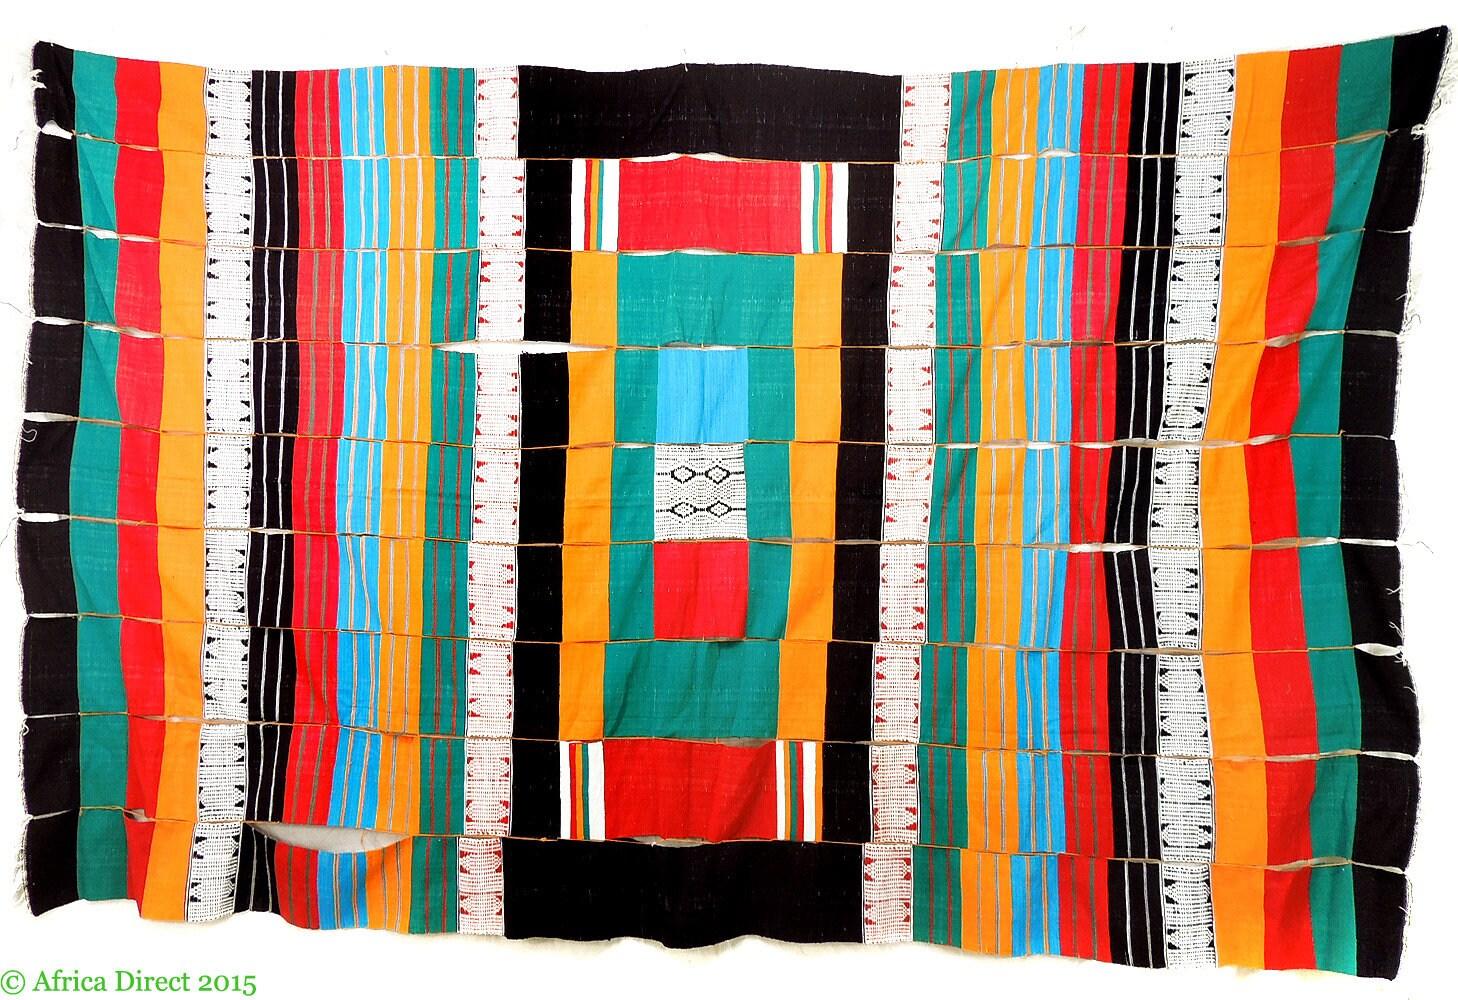 Djerma Djerma Djerma Haoussa tente Liner ou mural Niger de l'Art africain 92606 6b9d41